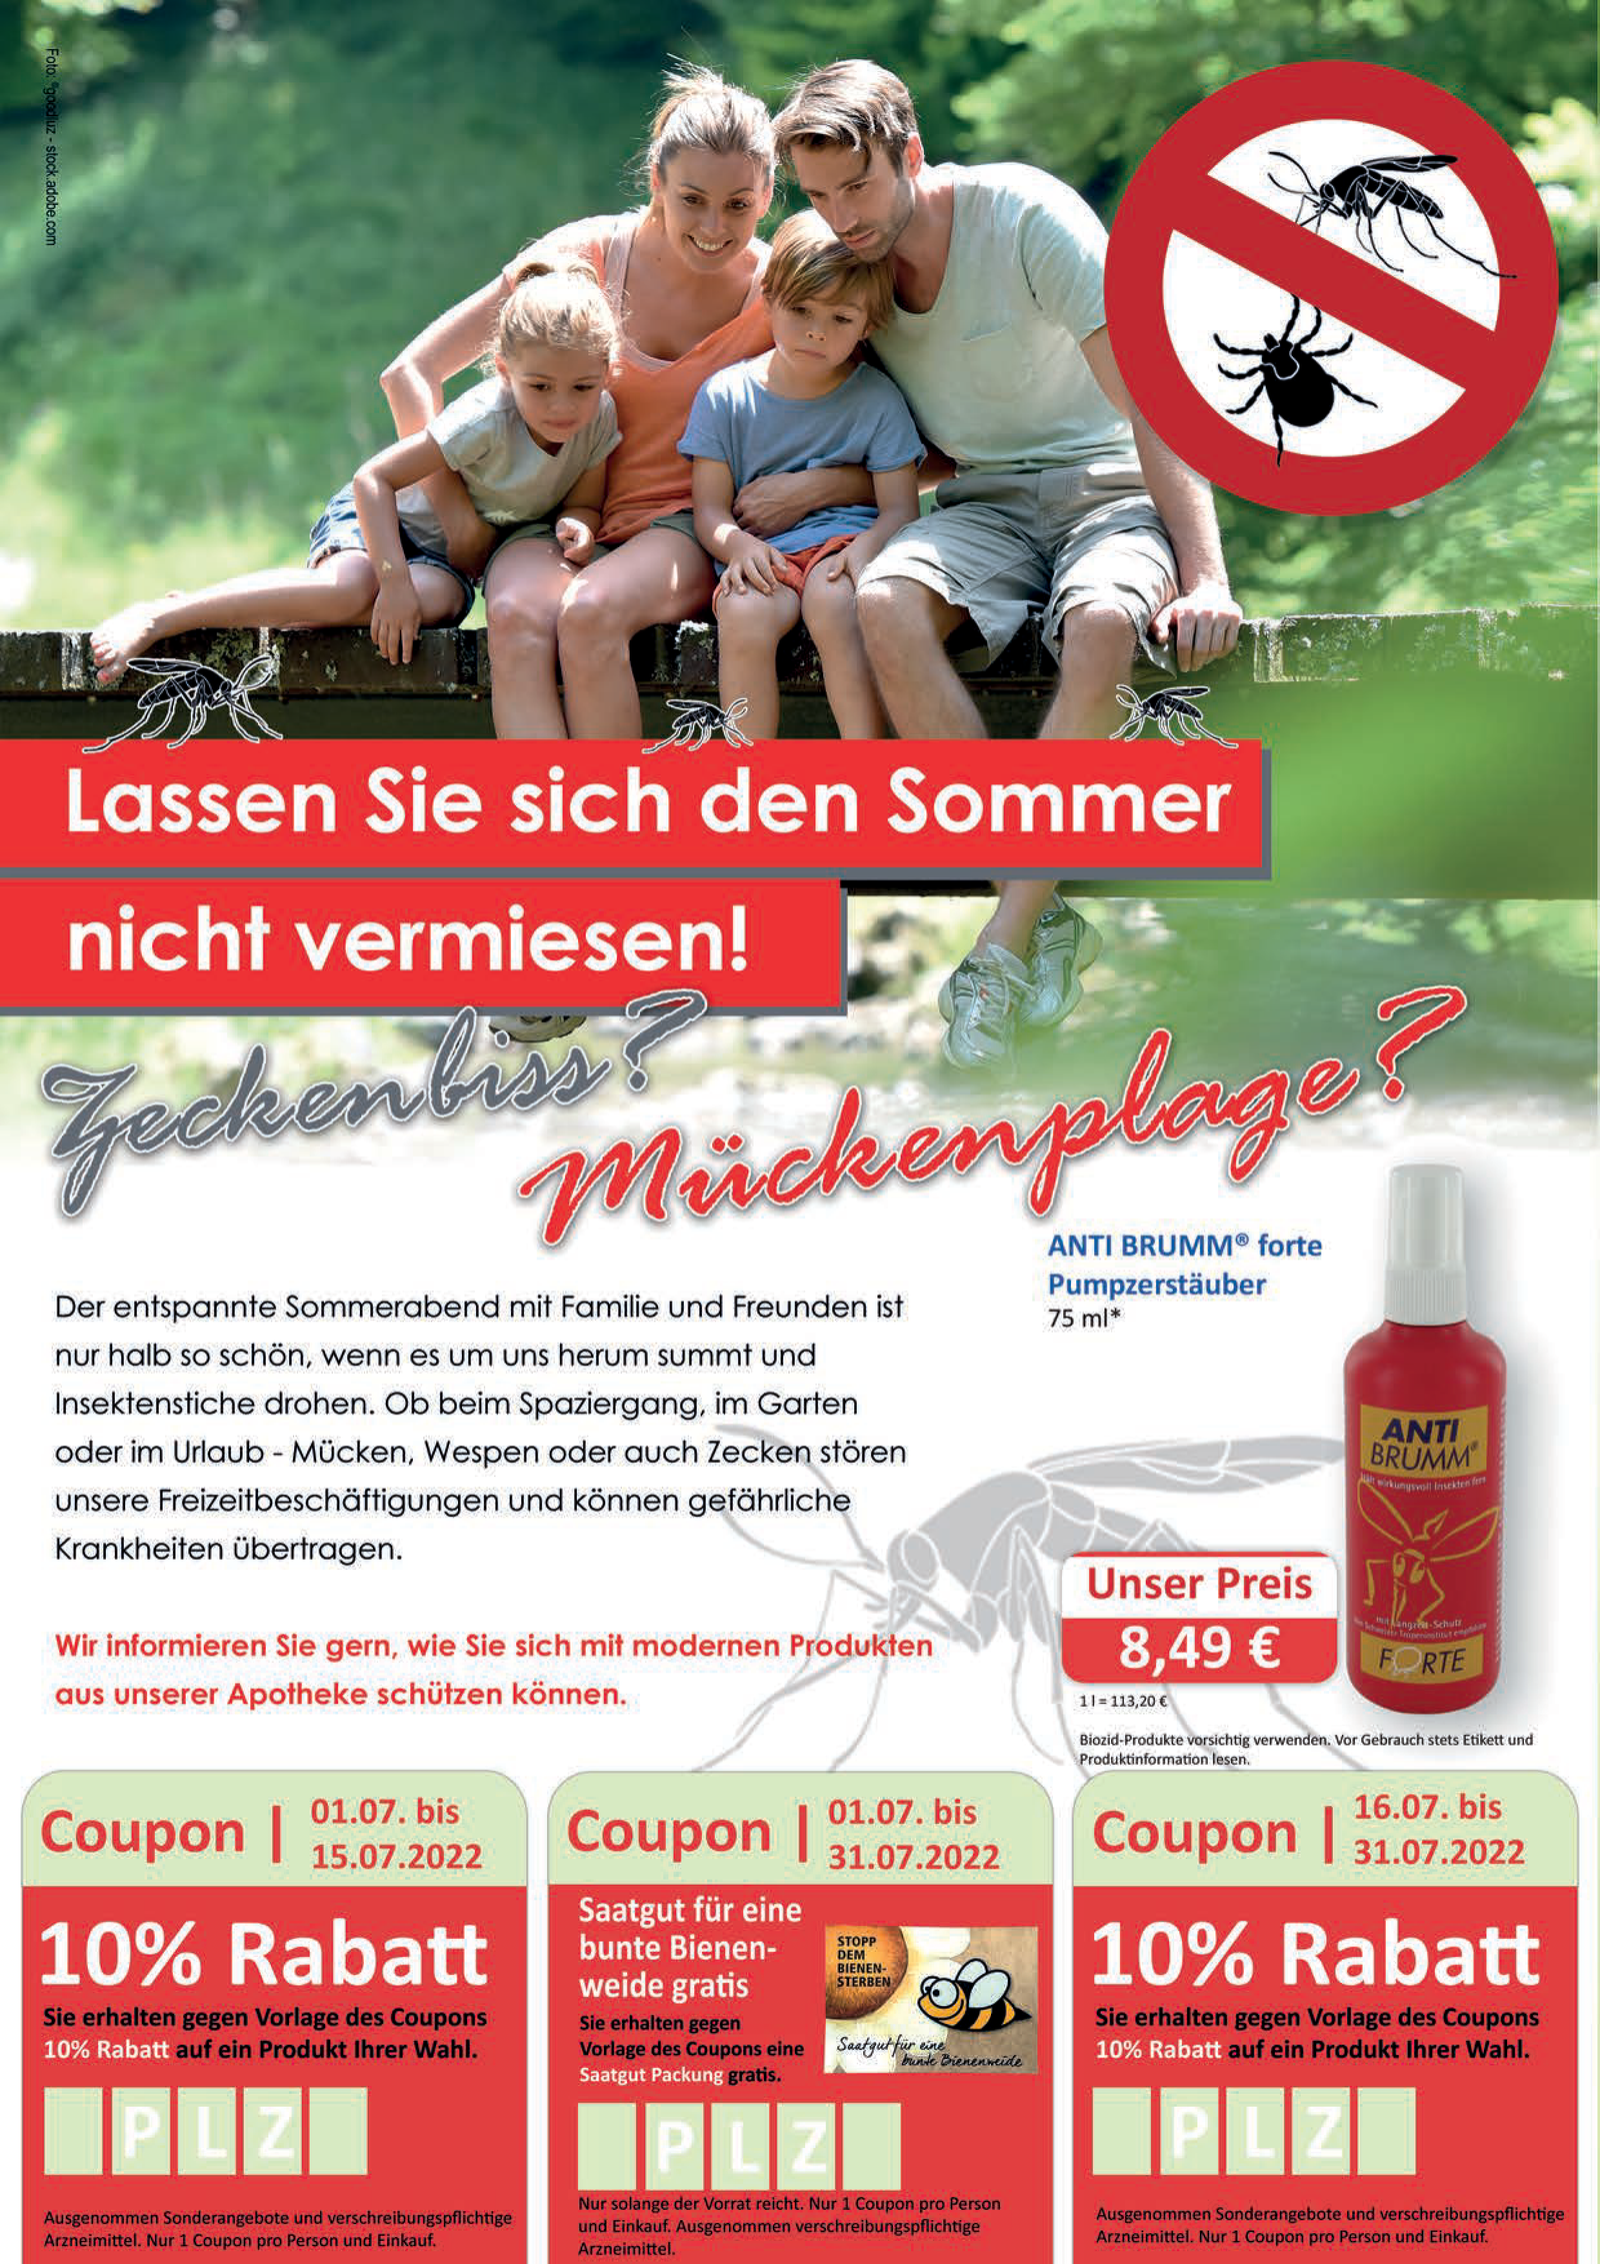 https://mein-uploads.apocdn.net/12086/leaflets/12086_flyer-Seite2.png